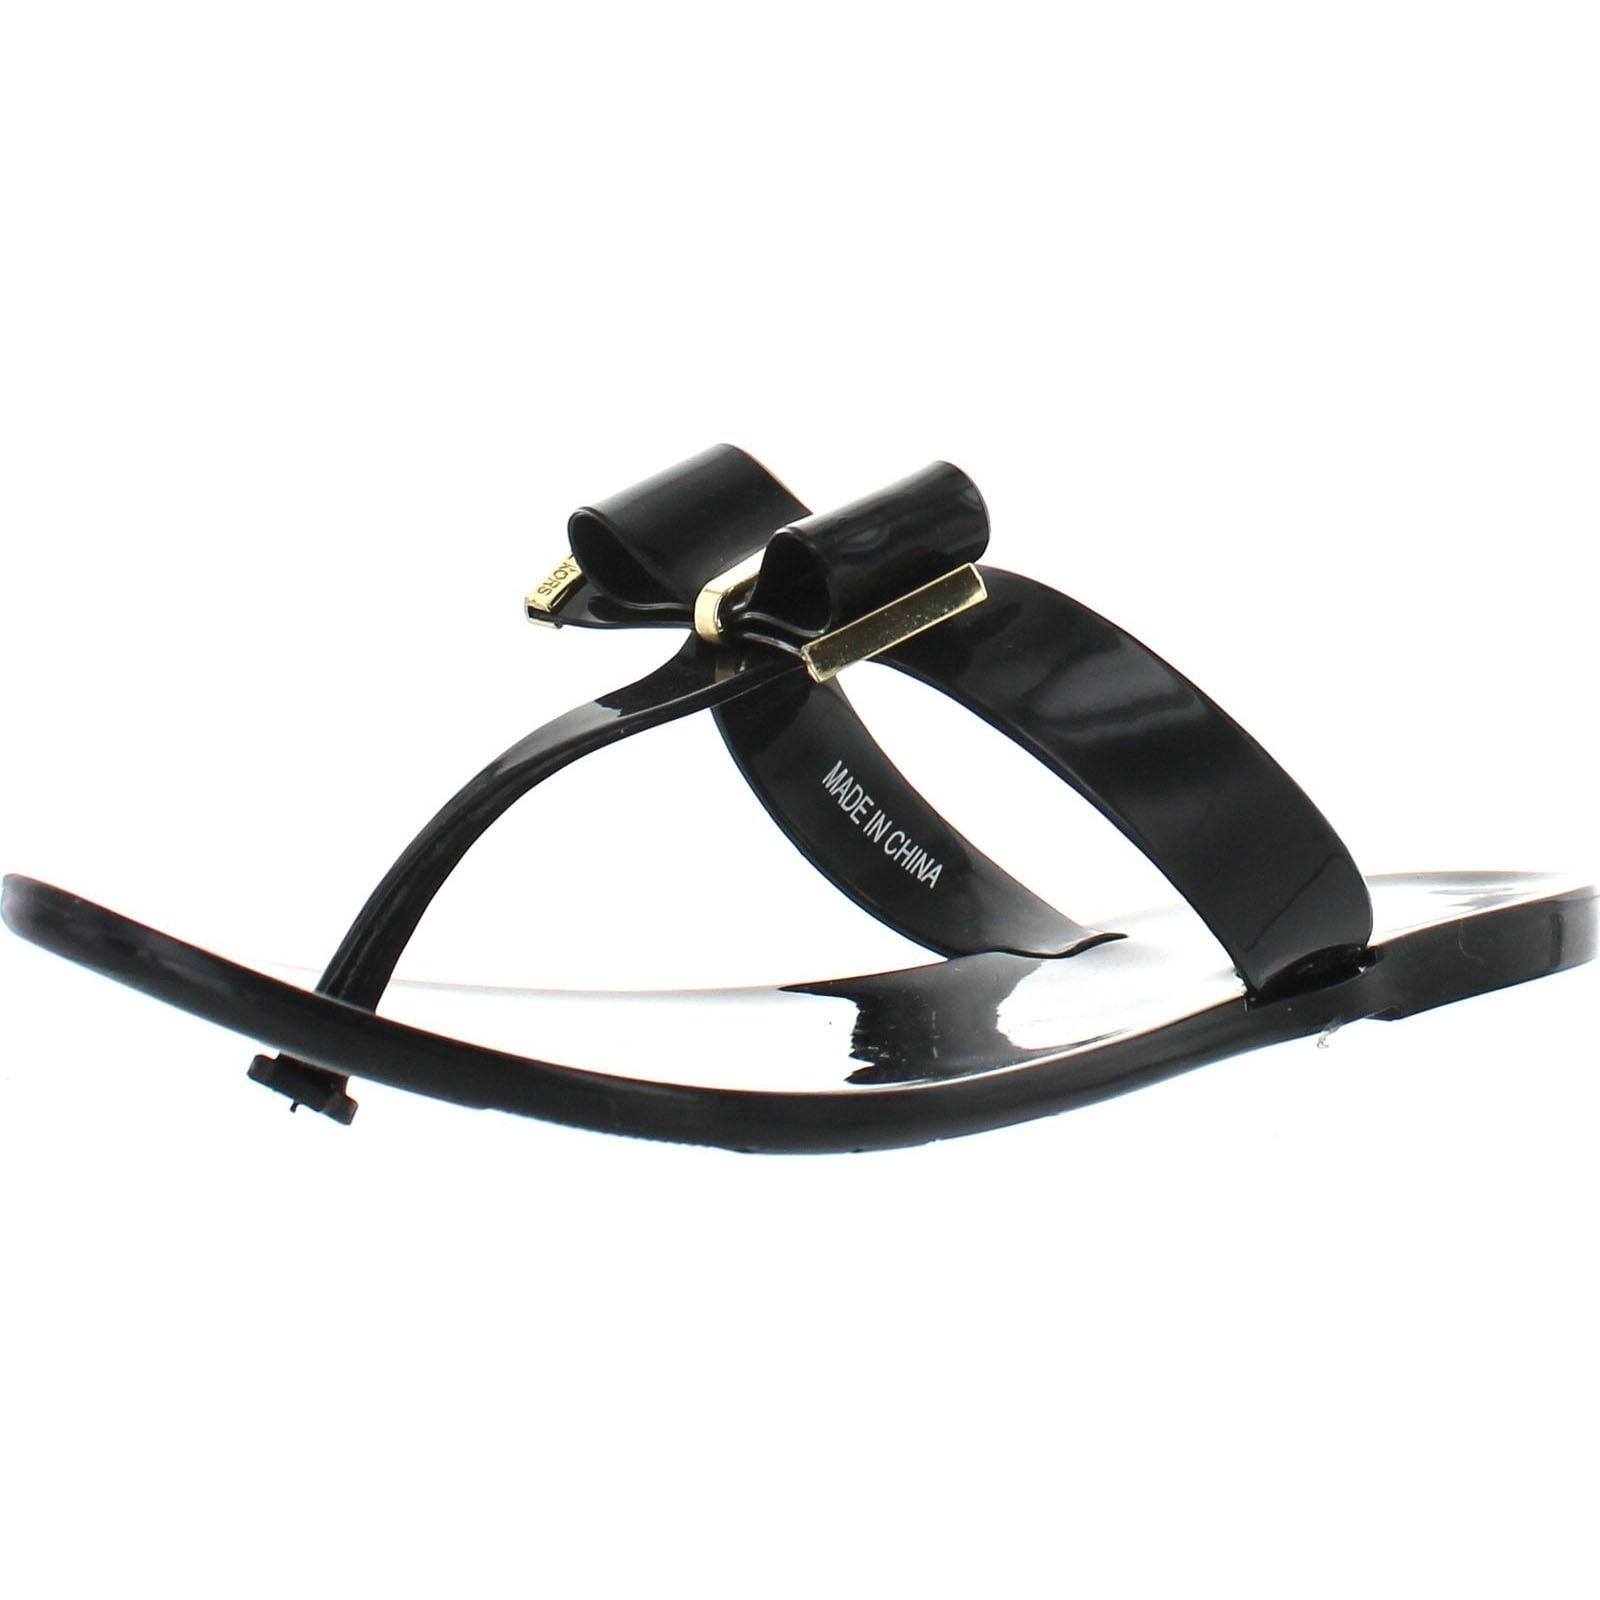 d7fc50495 Shop Michael Kors Jelly Kayden Fashion Flip Flop Sandals - Free ...